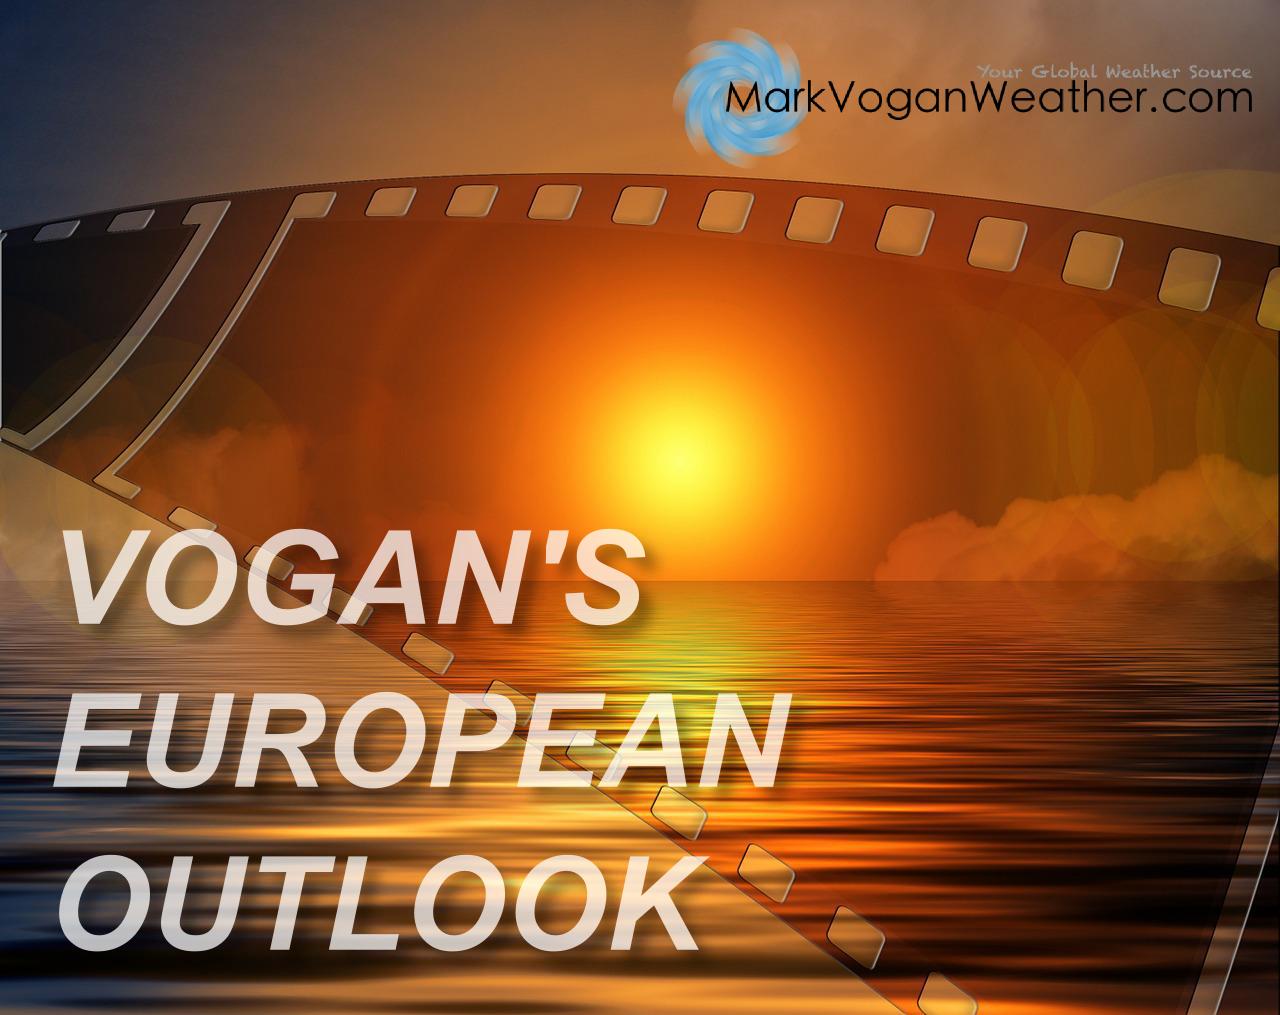 TUE 29 APR: VOGAN'S EUROPEAN OUTLOOK